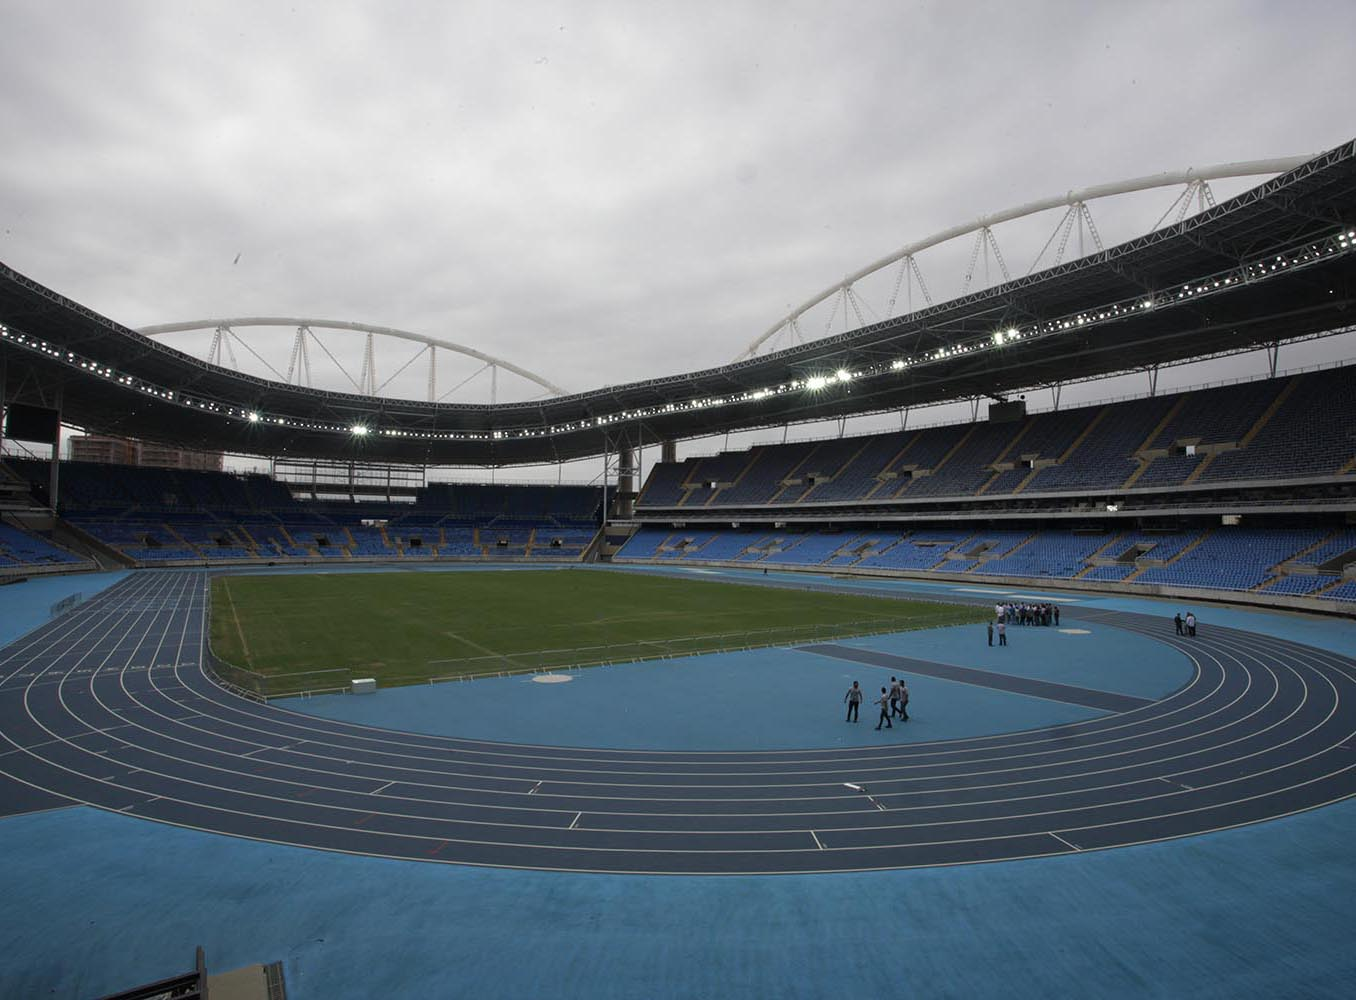 Entorno do Estádio Olímpico terá esquema especial de tráfego durante os Jogos